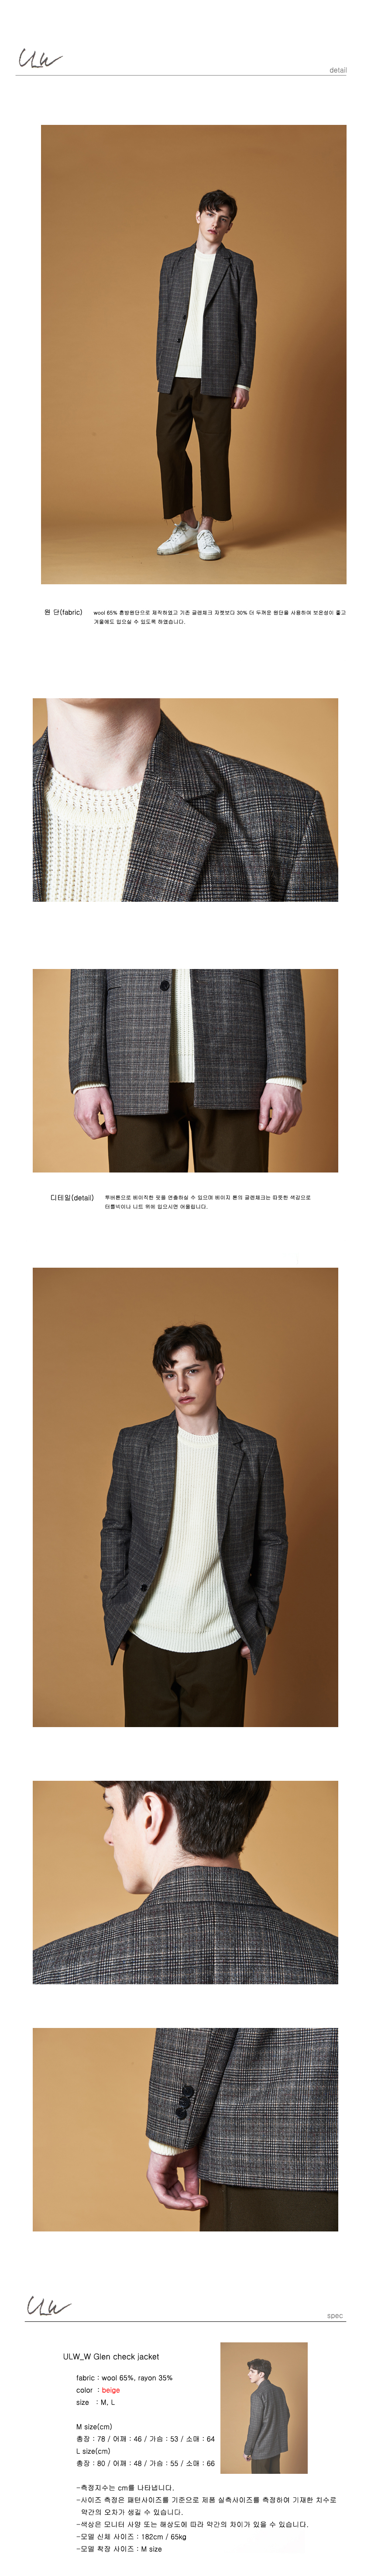 ulw-w-glen-check-jacket_2.jpg